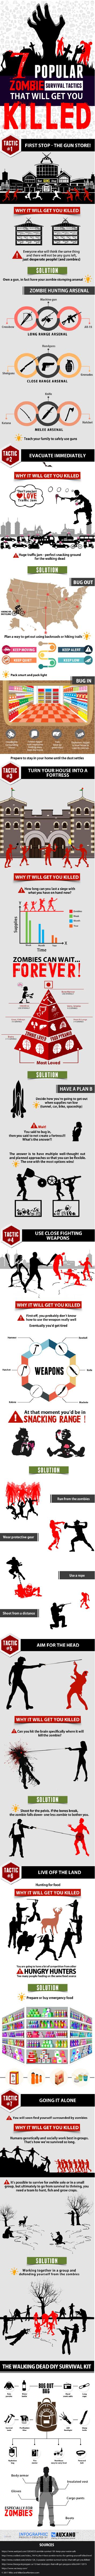 ZombiesInfographic-7-popular-zombie-survival-tactics